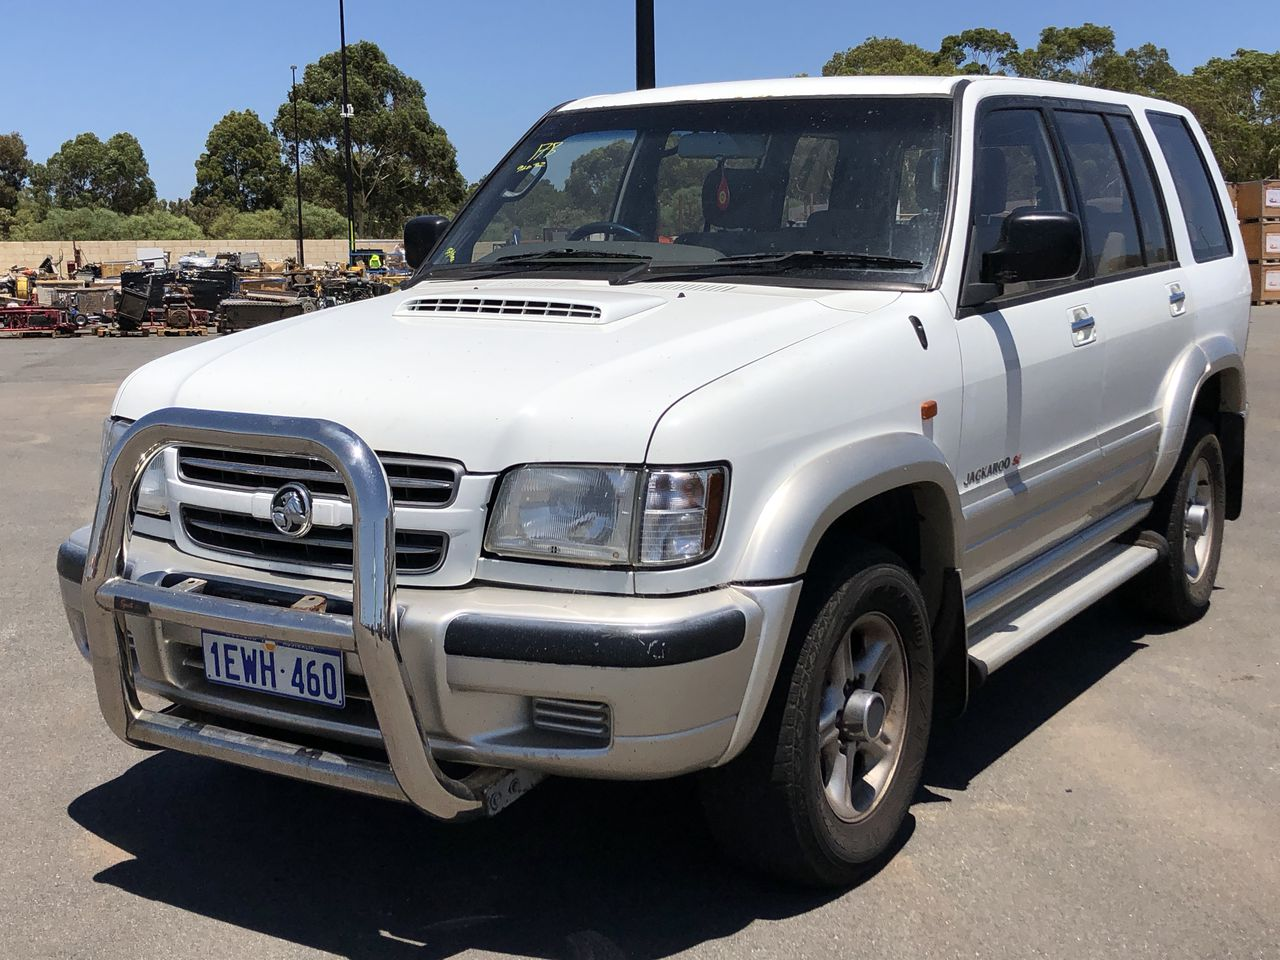 2002 Holden Jackaroo SE LWB (4x4) Turbo Diesel Automatic 7 Seats Wagon